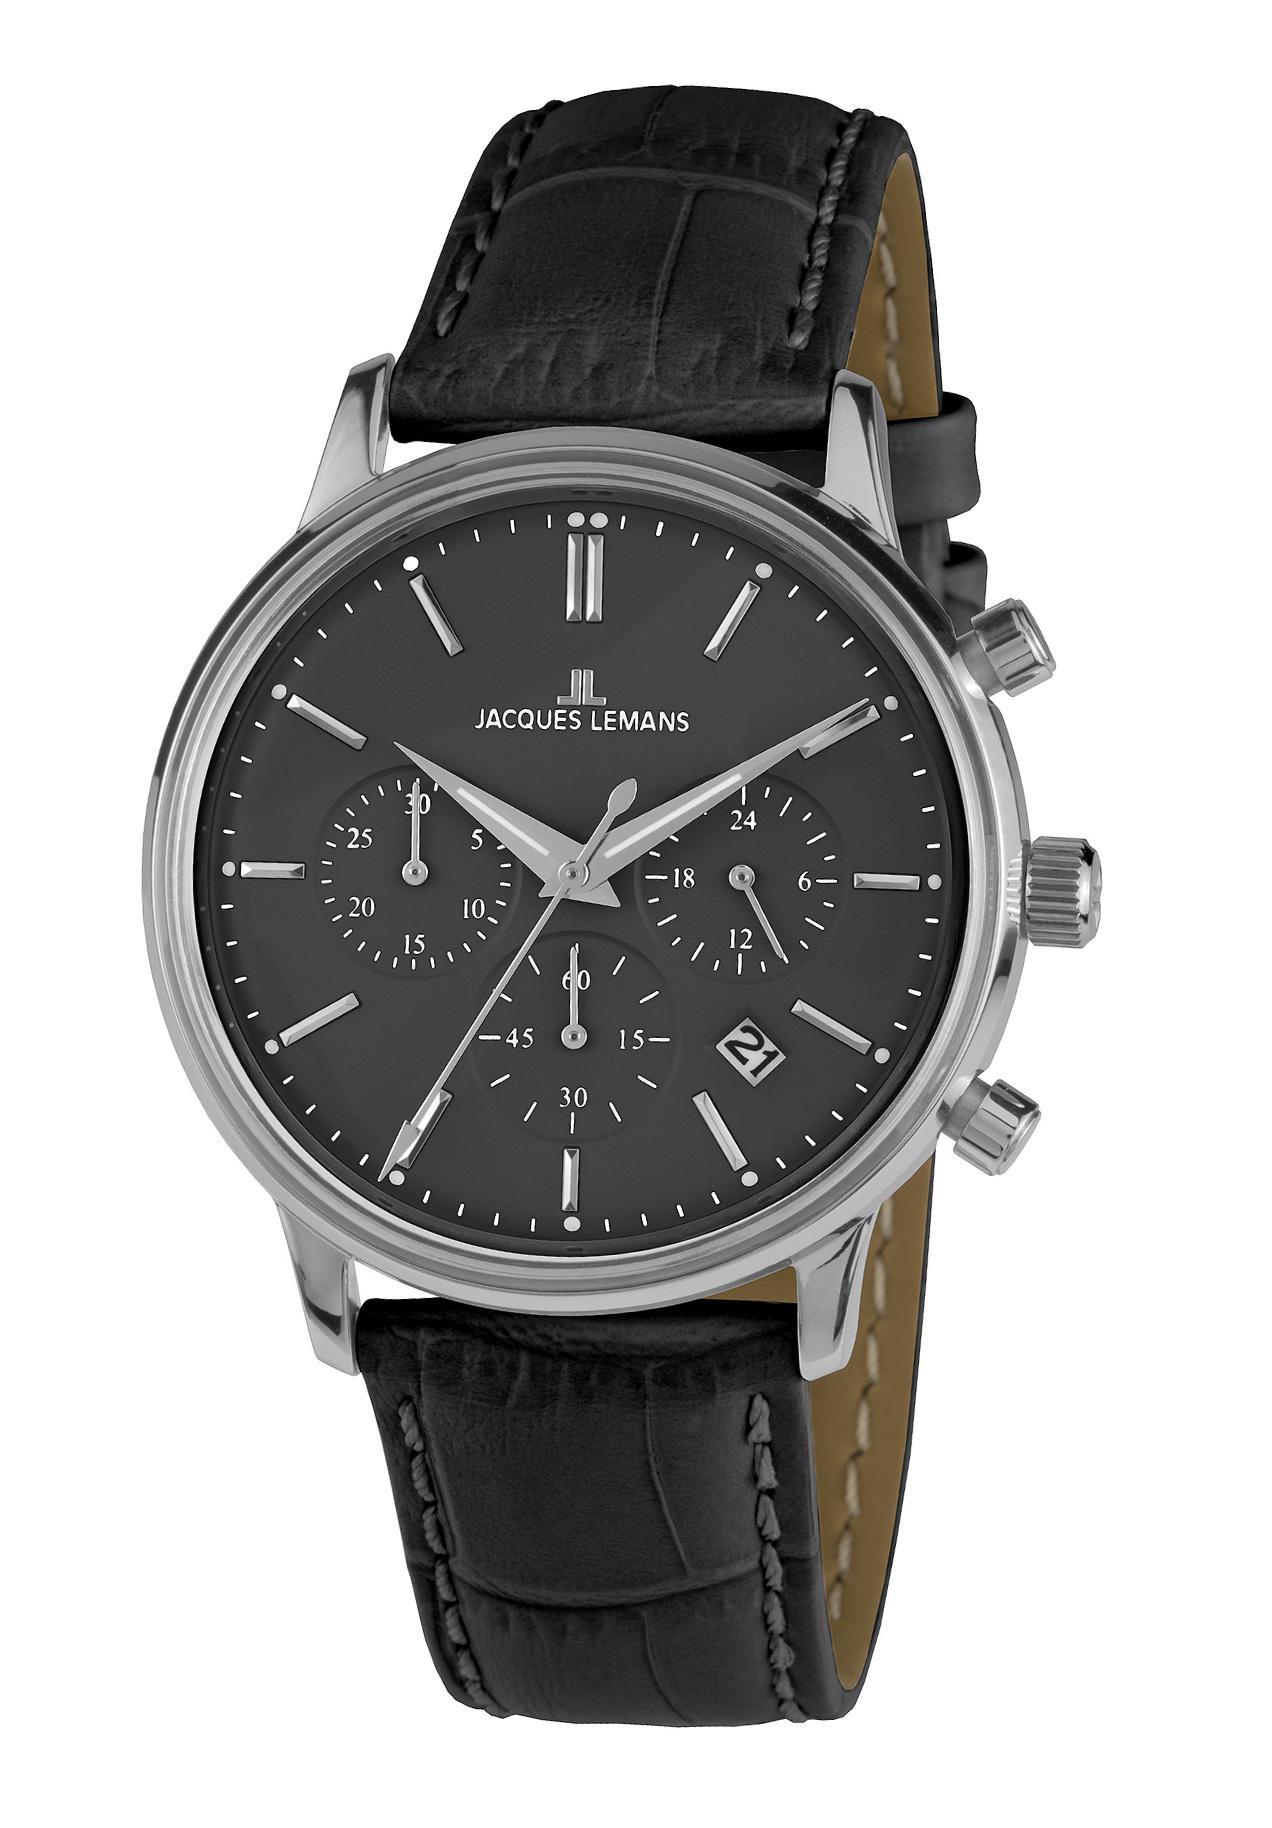 Jacques Lemans Herrenchronograph Retro Classic N-209P nur